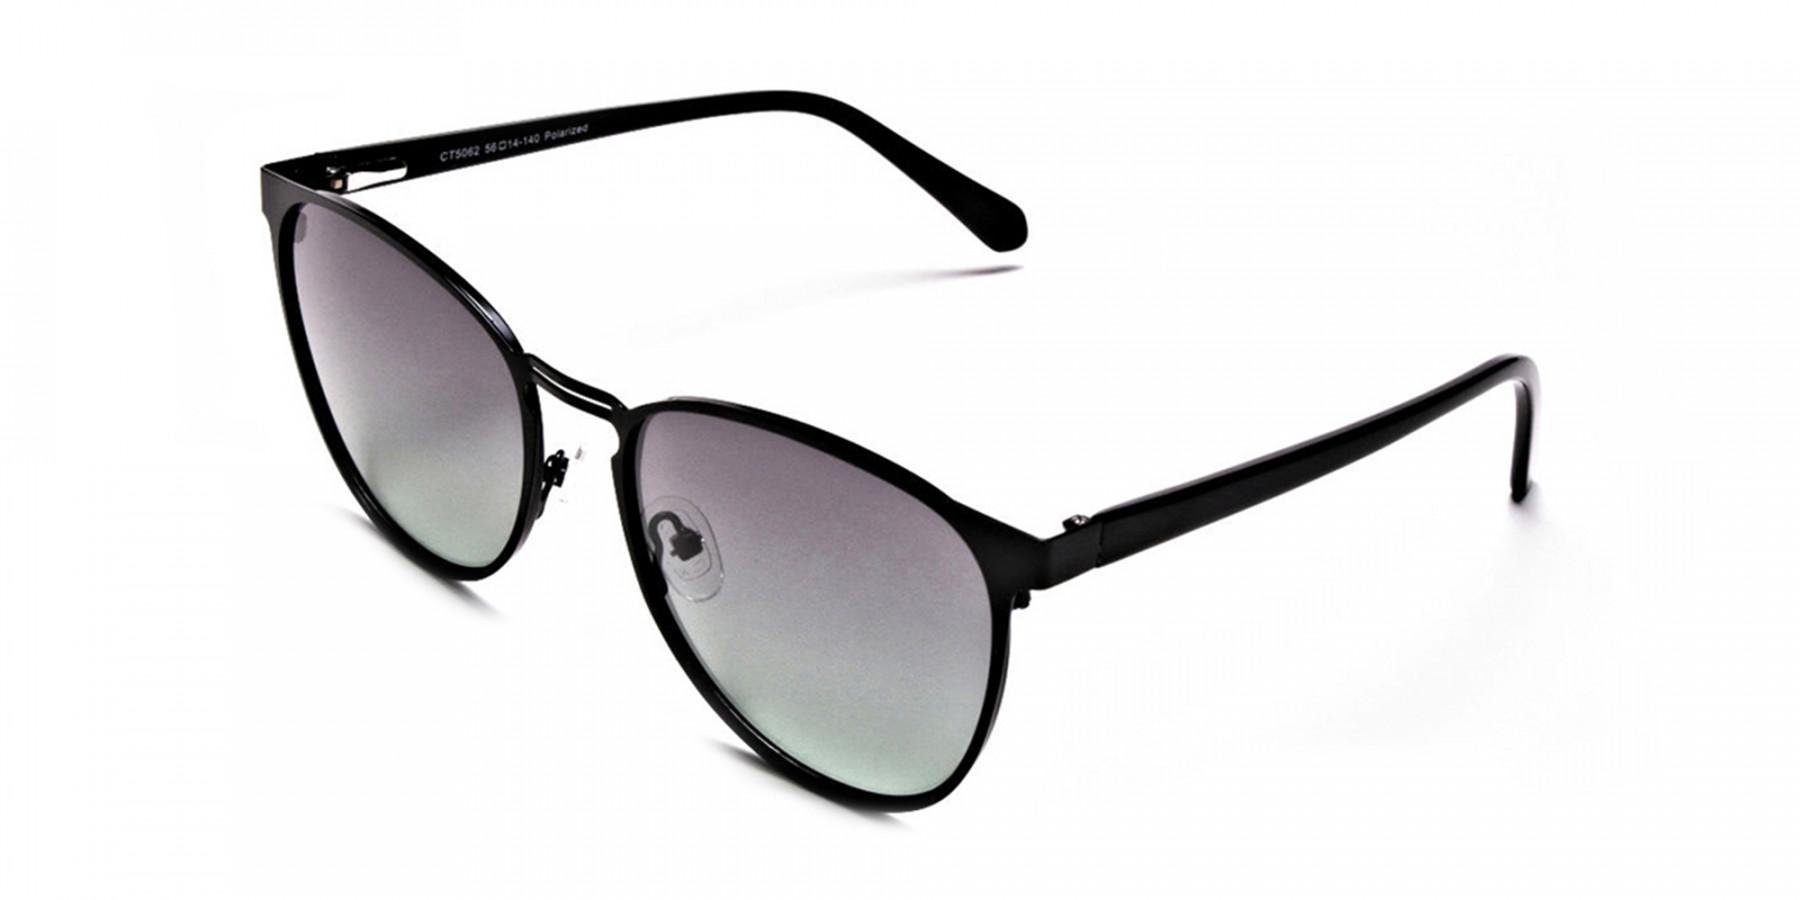 Black Green Tint Sunglasses -3